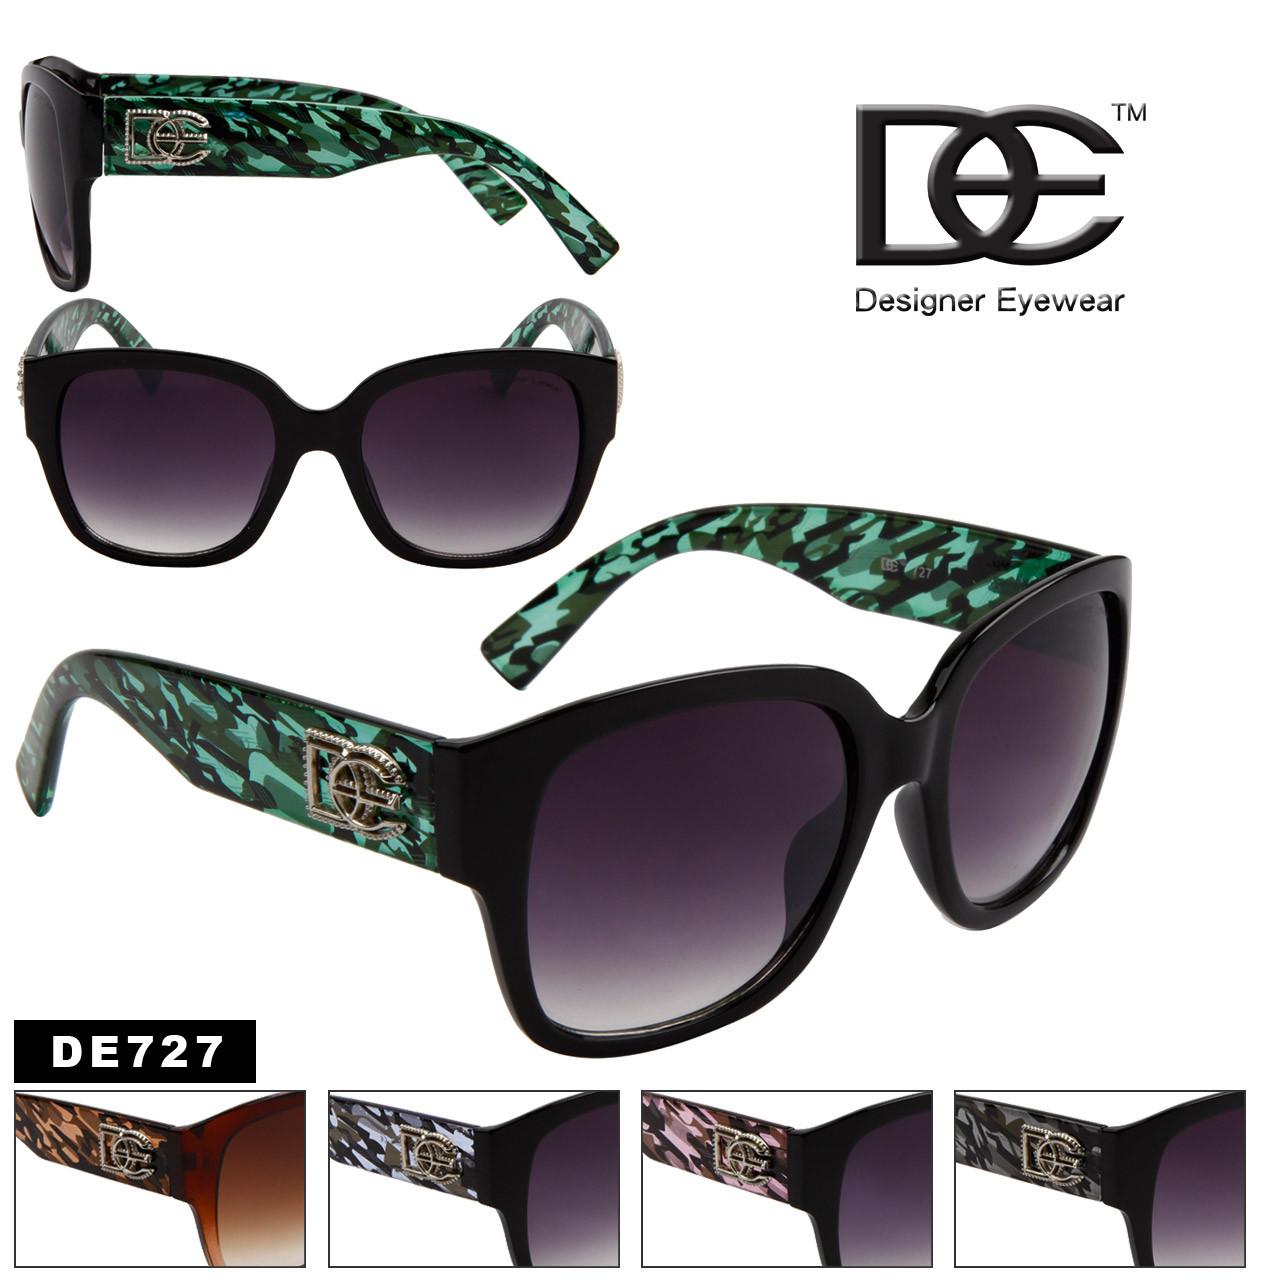 Wholesale DE™ Designer Eyewear by the Dozen - Style # DE727